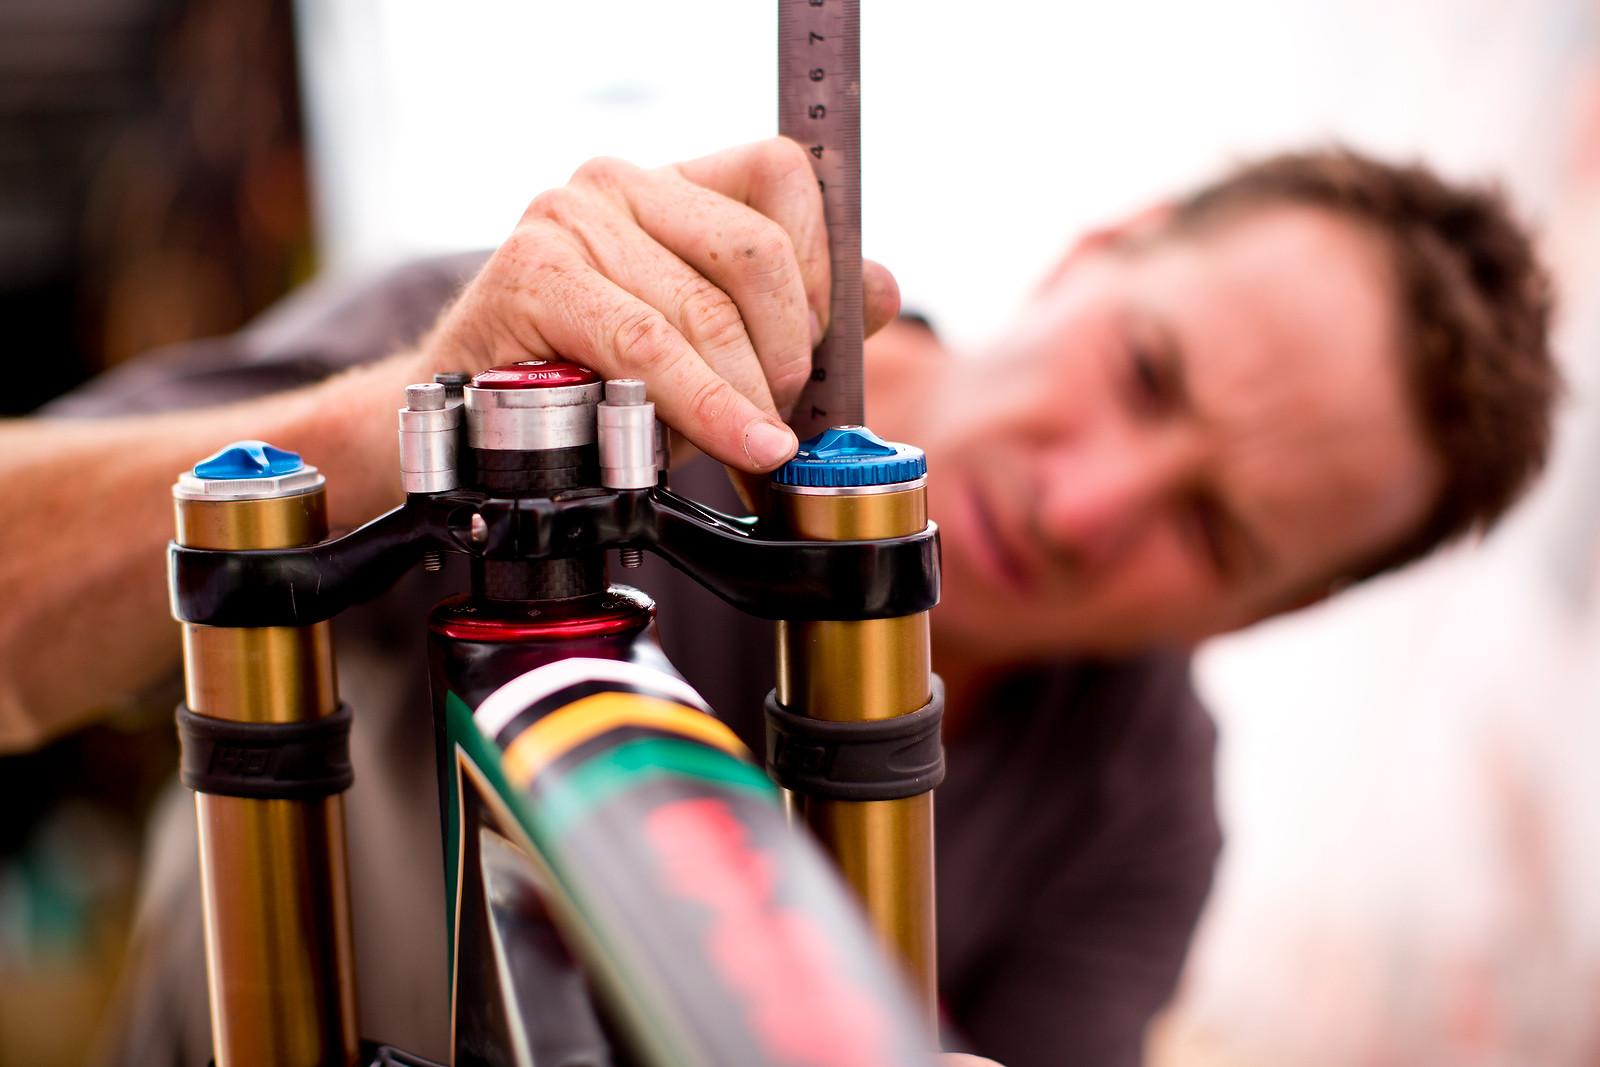 Greg Minnaar's 2012 World Champs Santa Cruz V10 - New Kits and Gear for 2012 World Championships - Mountain Biking Pictures - Vital MTB